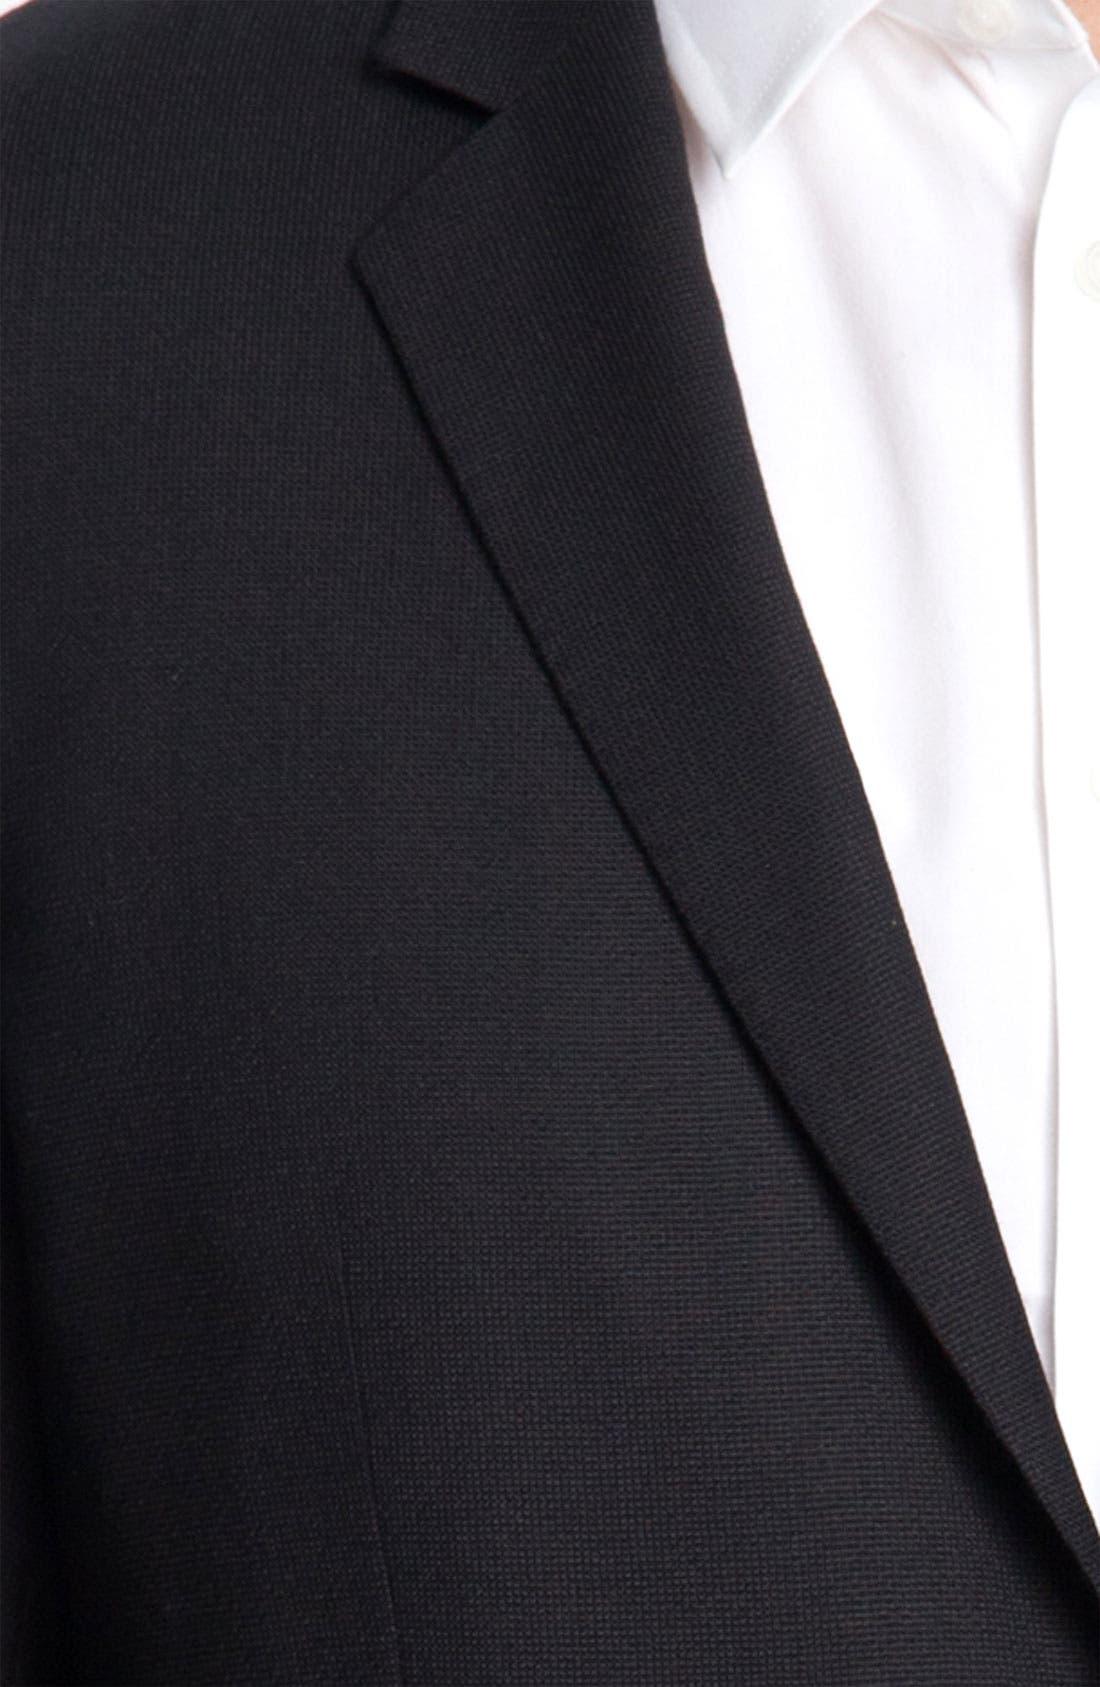 Alternate Image 3  - BOSS Black 'Rover' Extra Trim Fit Blazer